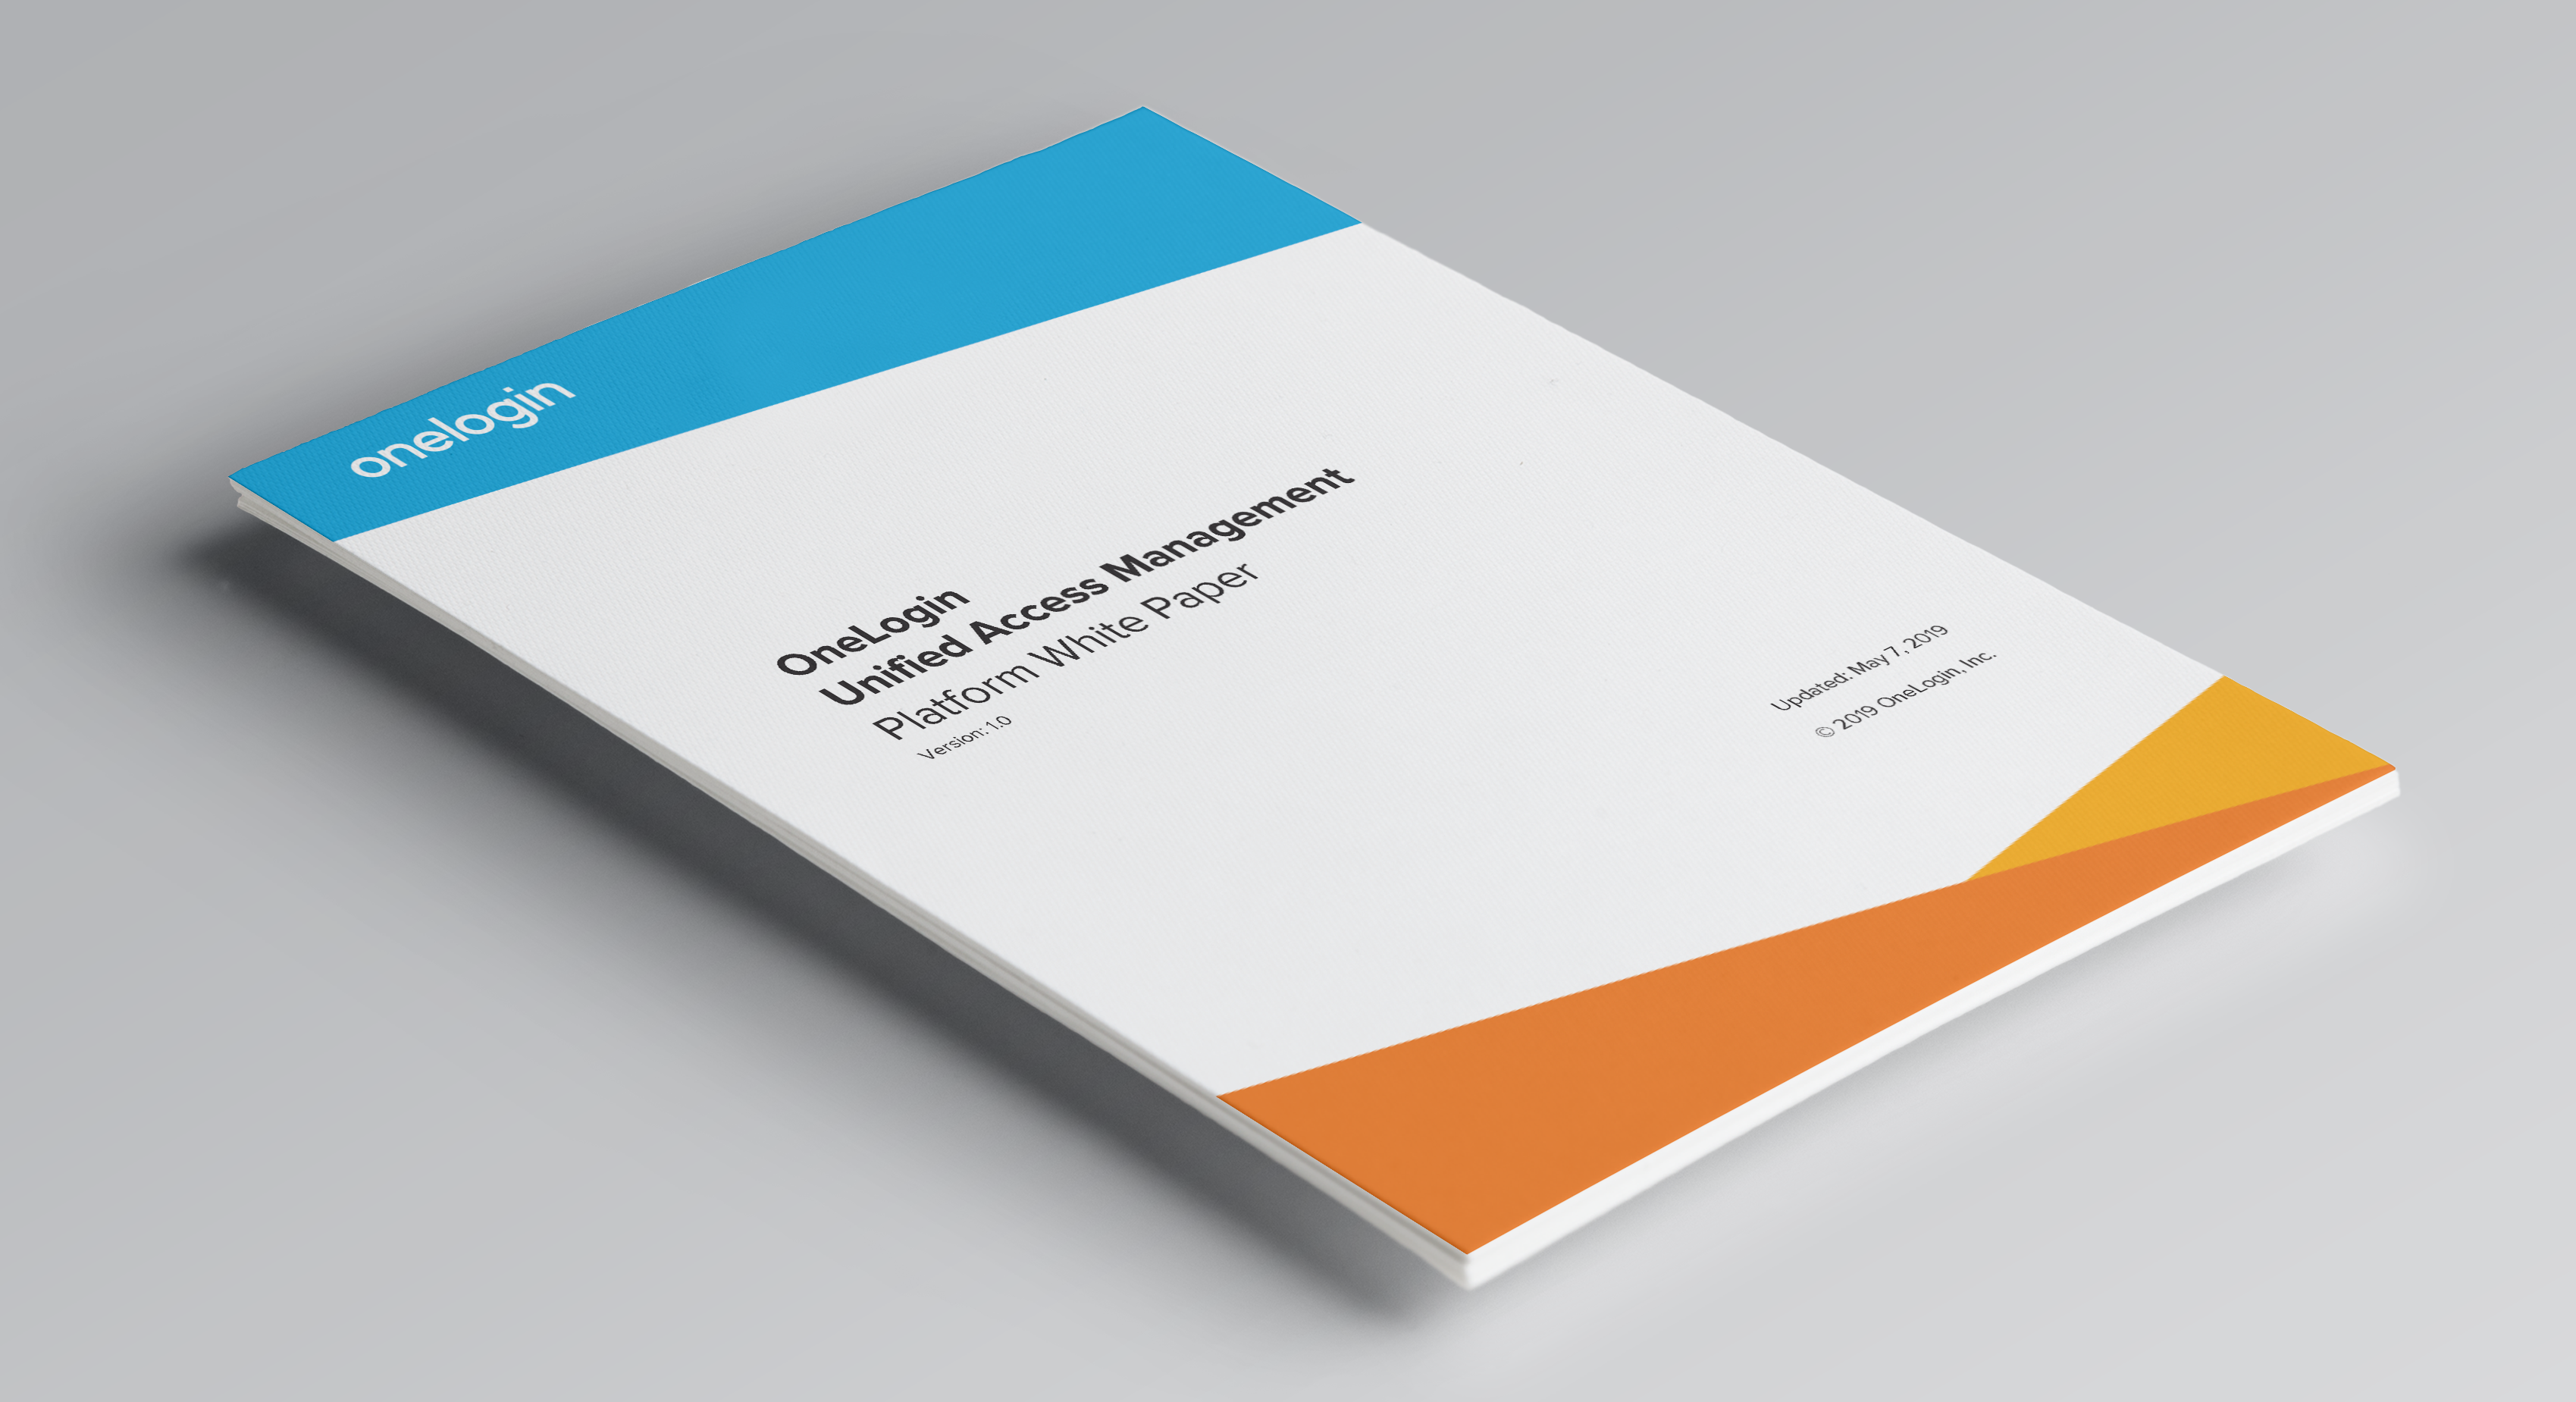 OneLogin Unified Access Management Platform Whitepaper